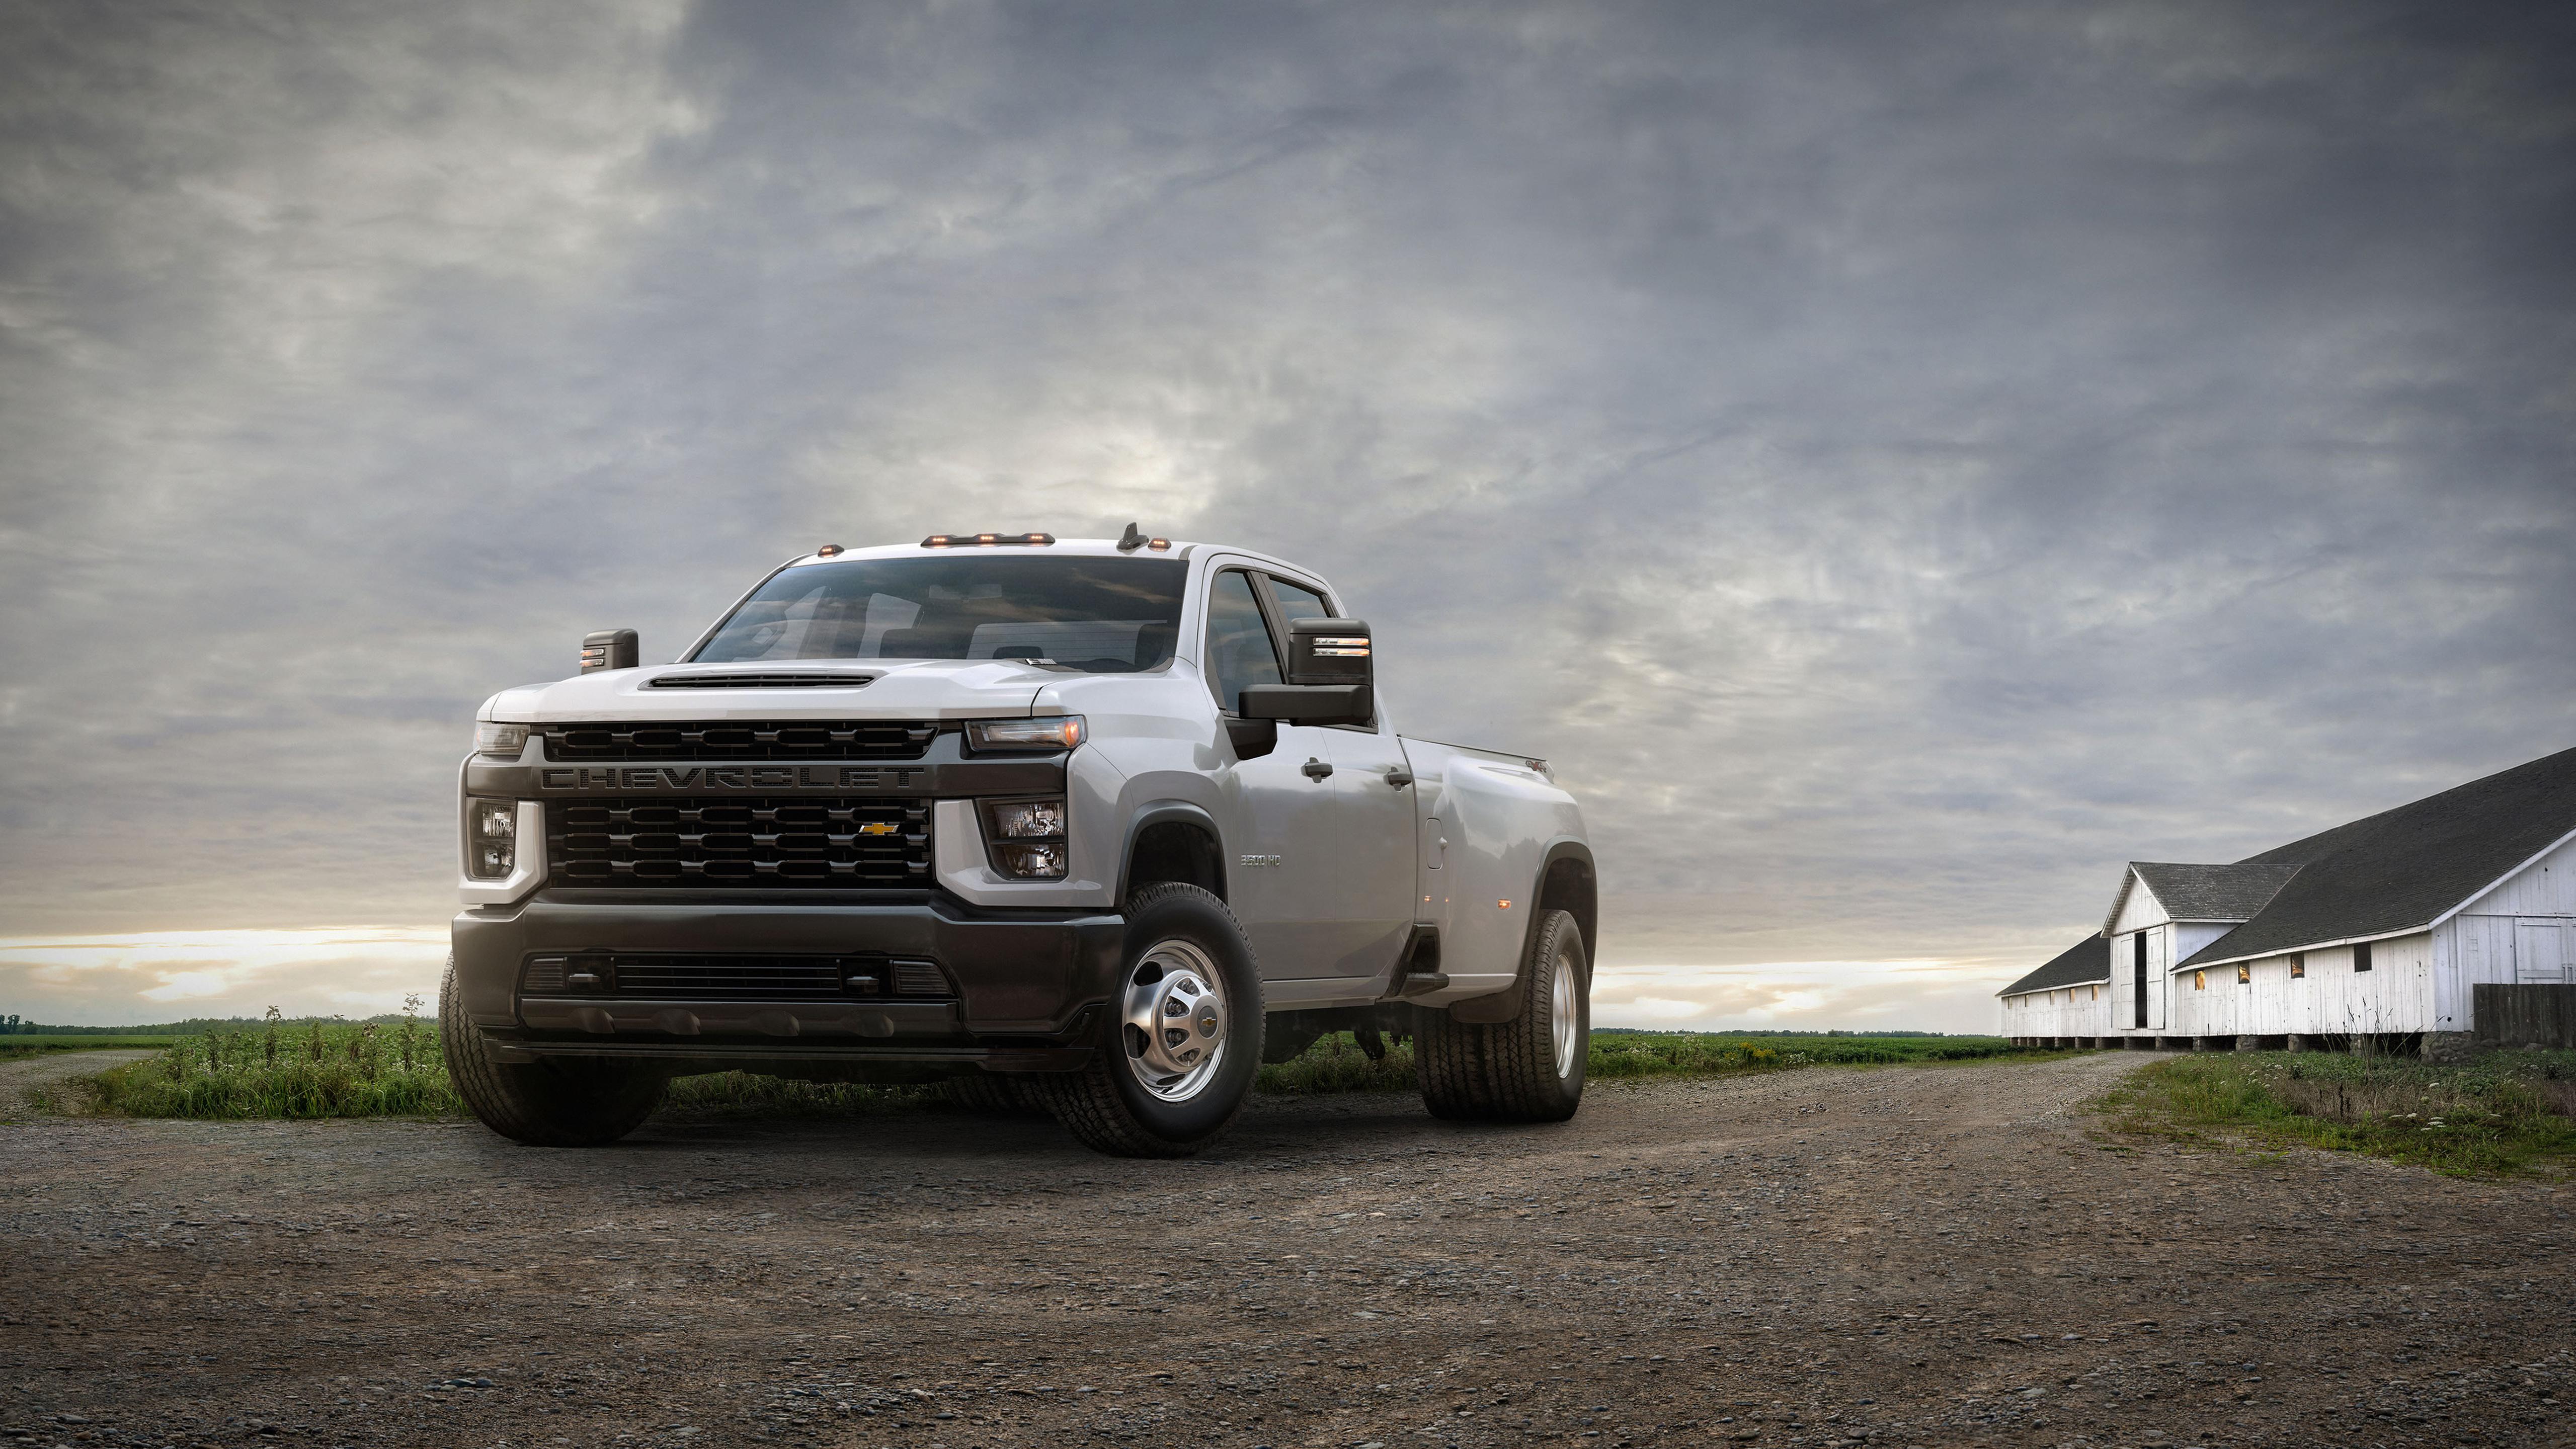 2020 Chevrolet Silverado 3500 HD DRW Work Truck 4K Wallpaper HD 5120x2880